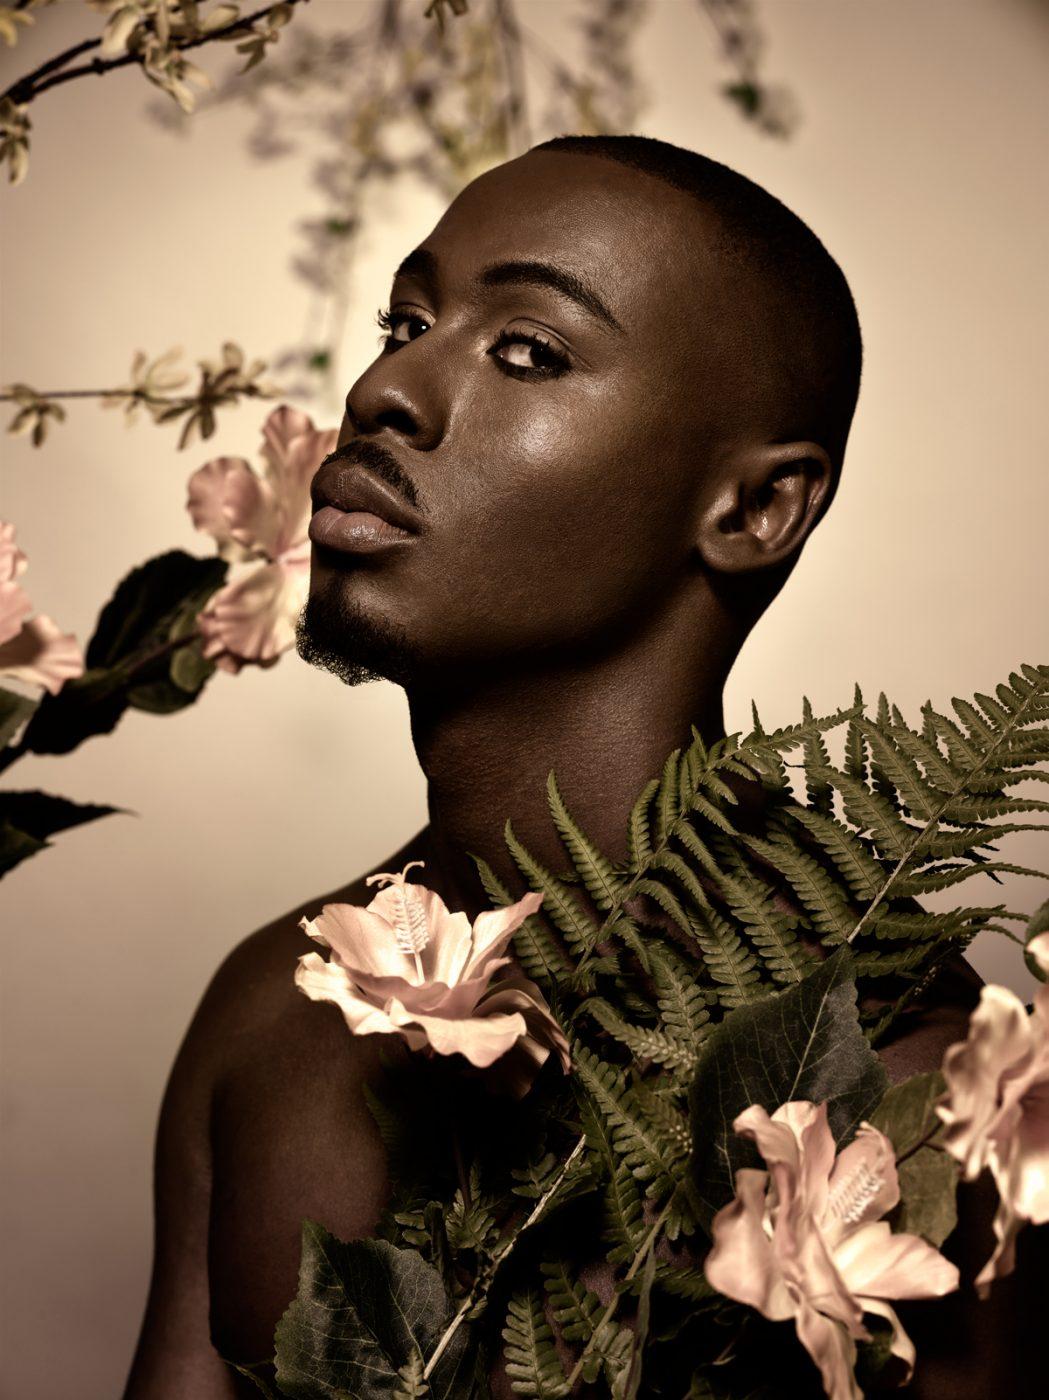 Renata Dutree: Daniel with Flowers III